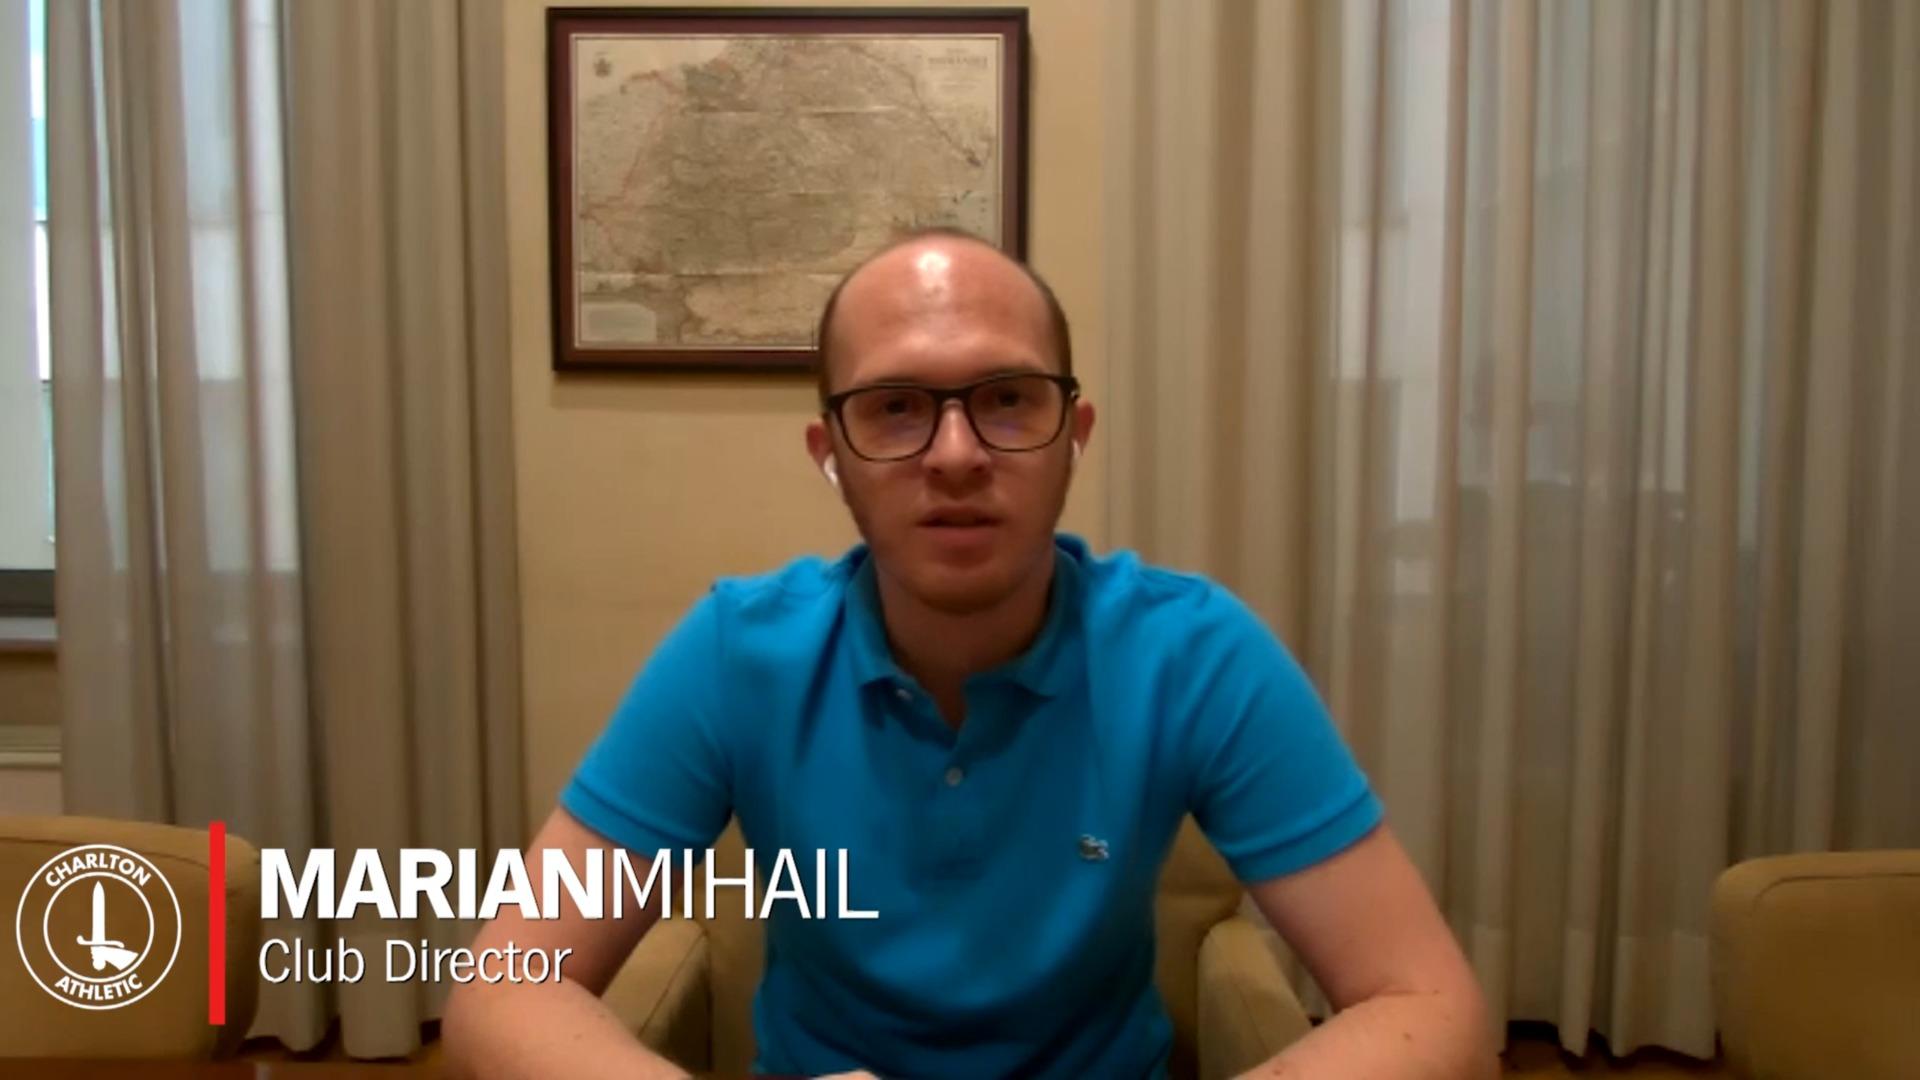 Marian Mihail interview (August 2020)